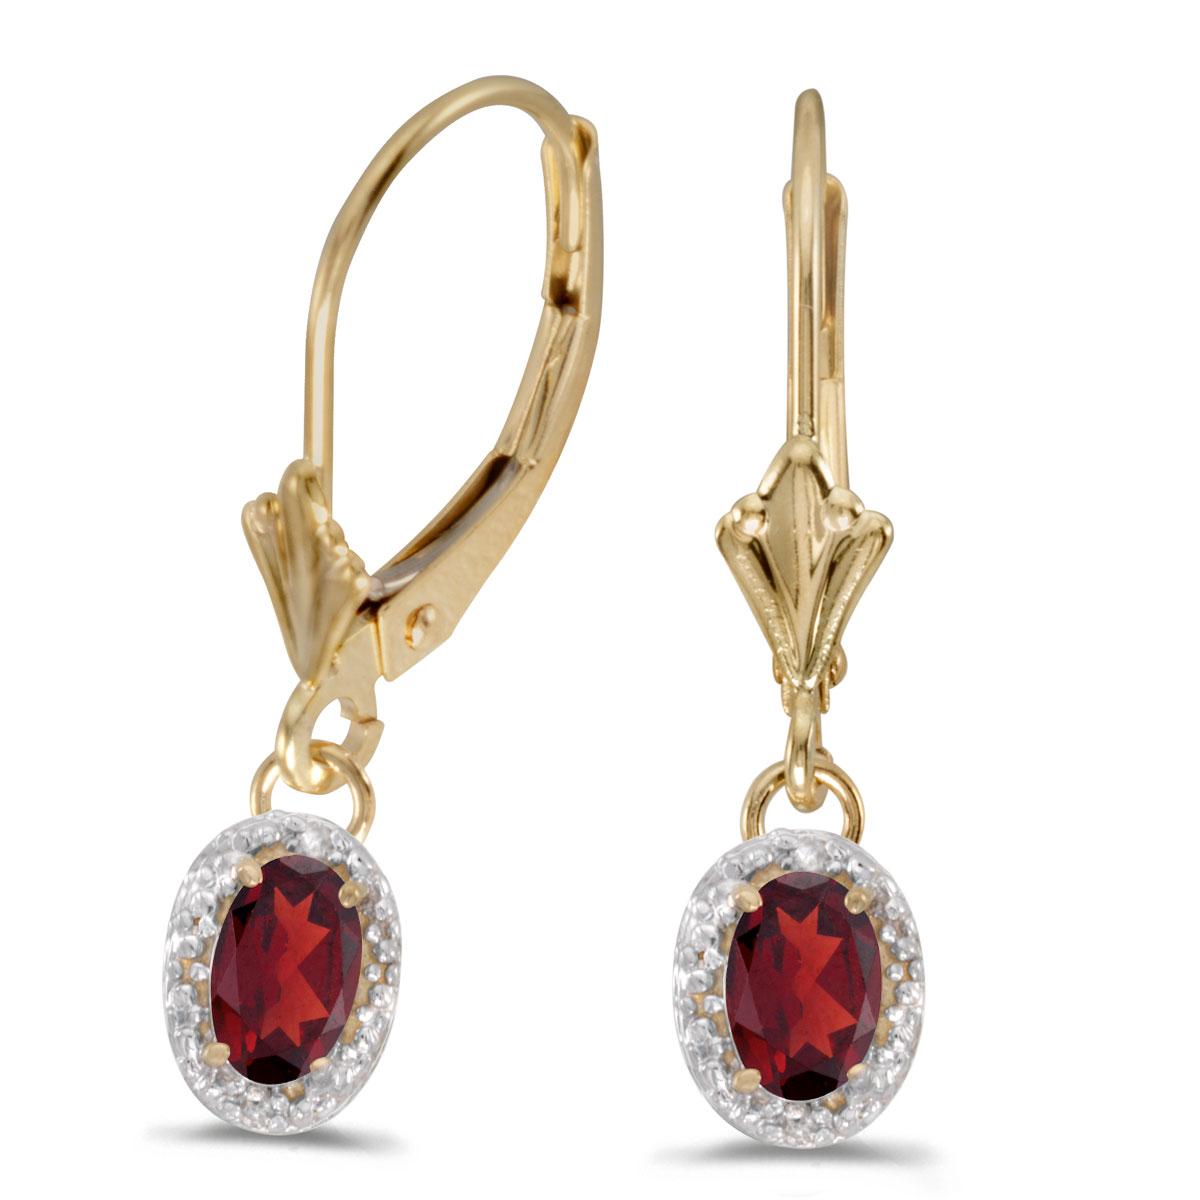 14k Yellow Gold Oval Garnet And Diamond Leverback Earrings